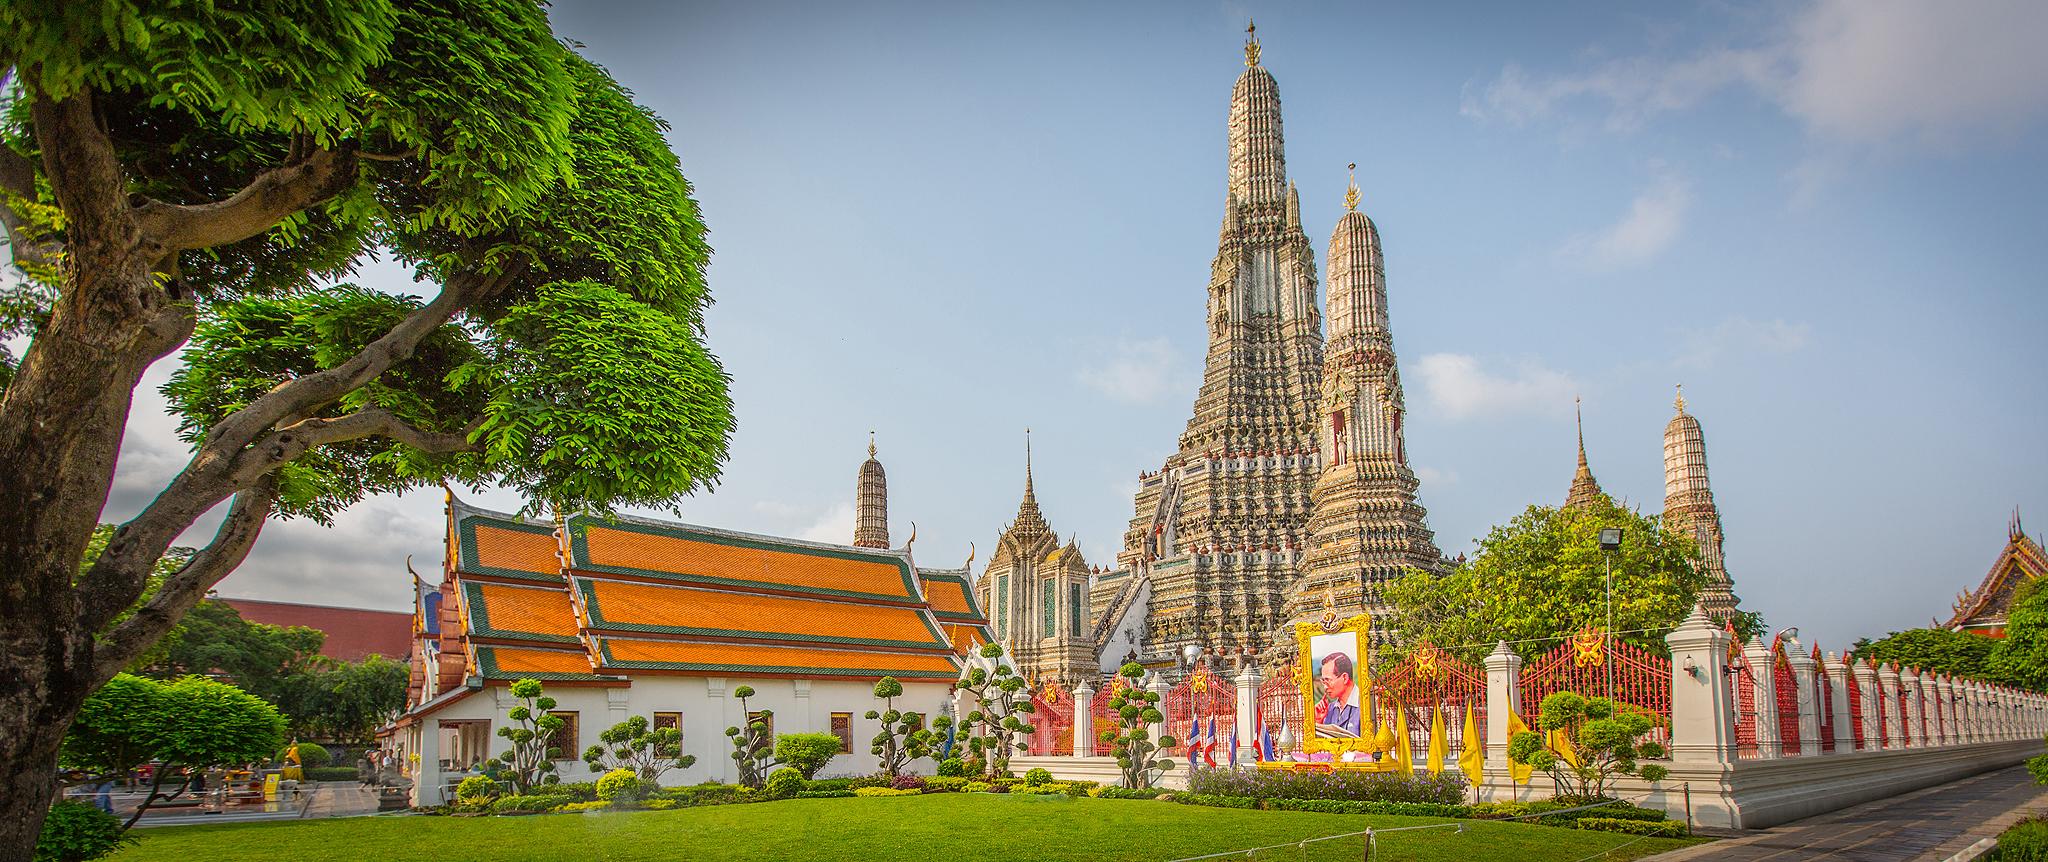 Wat Arun in Bangkok (Thailand) ©PhotoTravelNomads.com